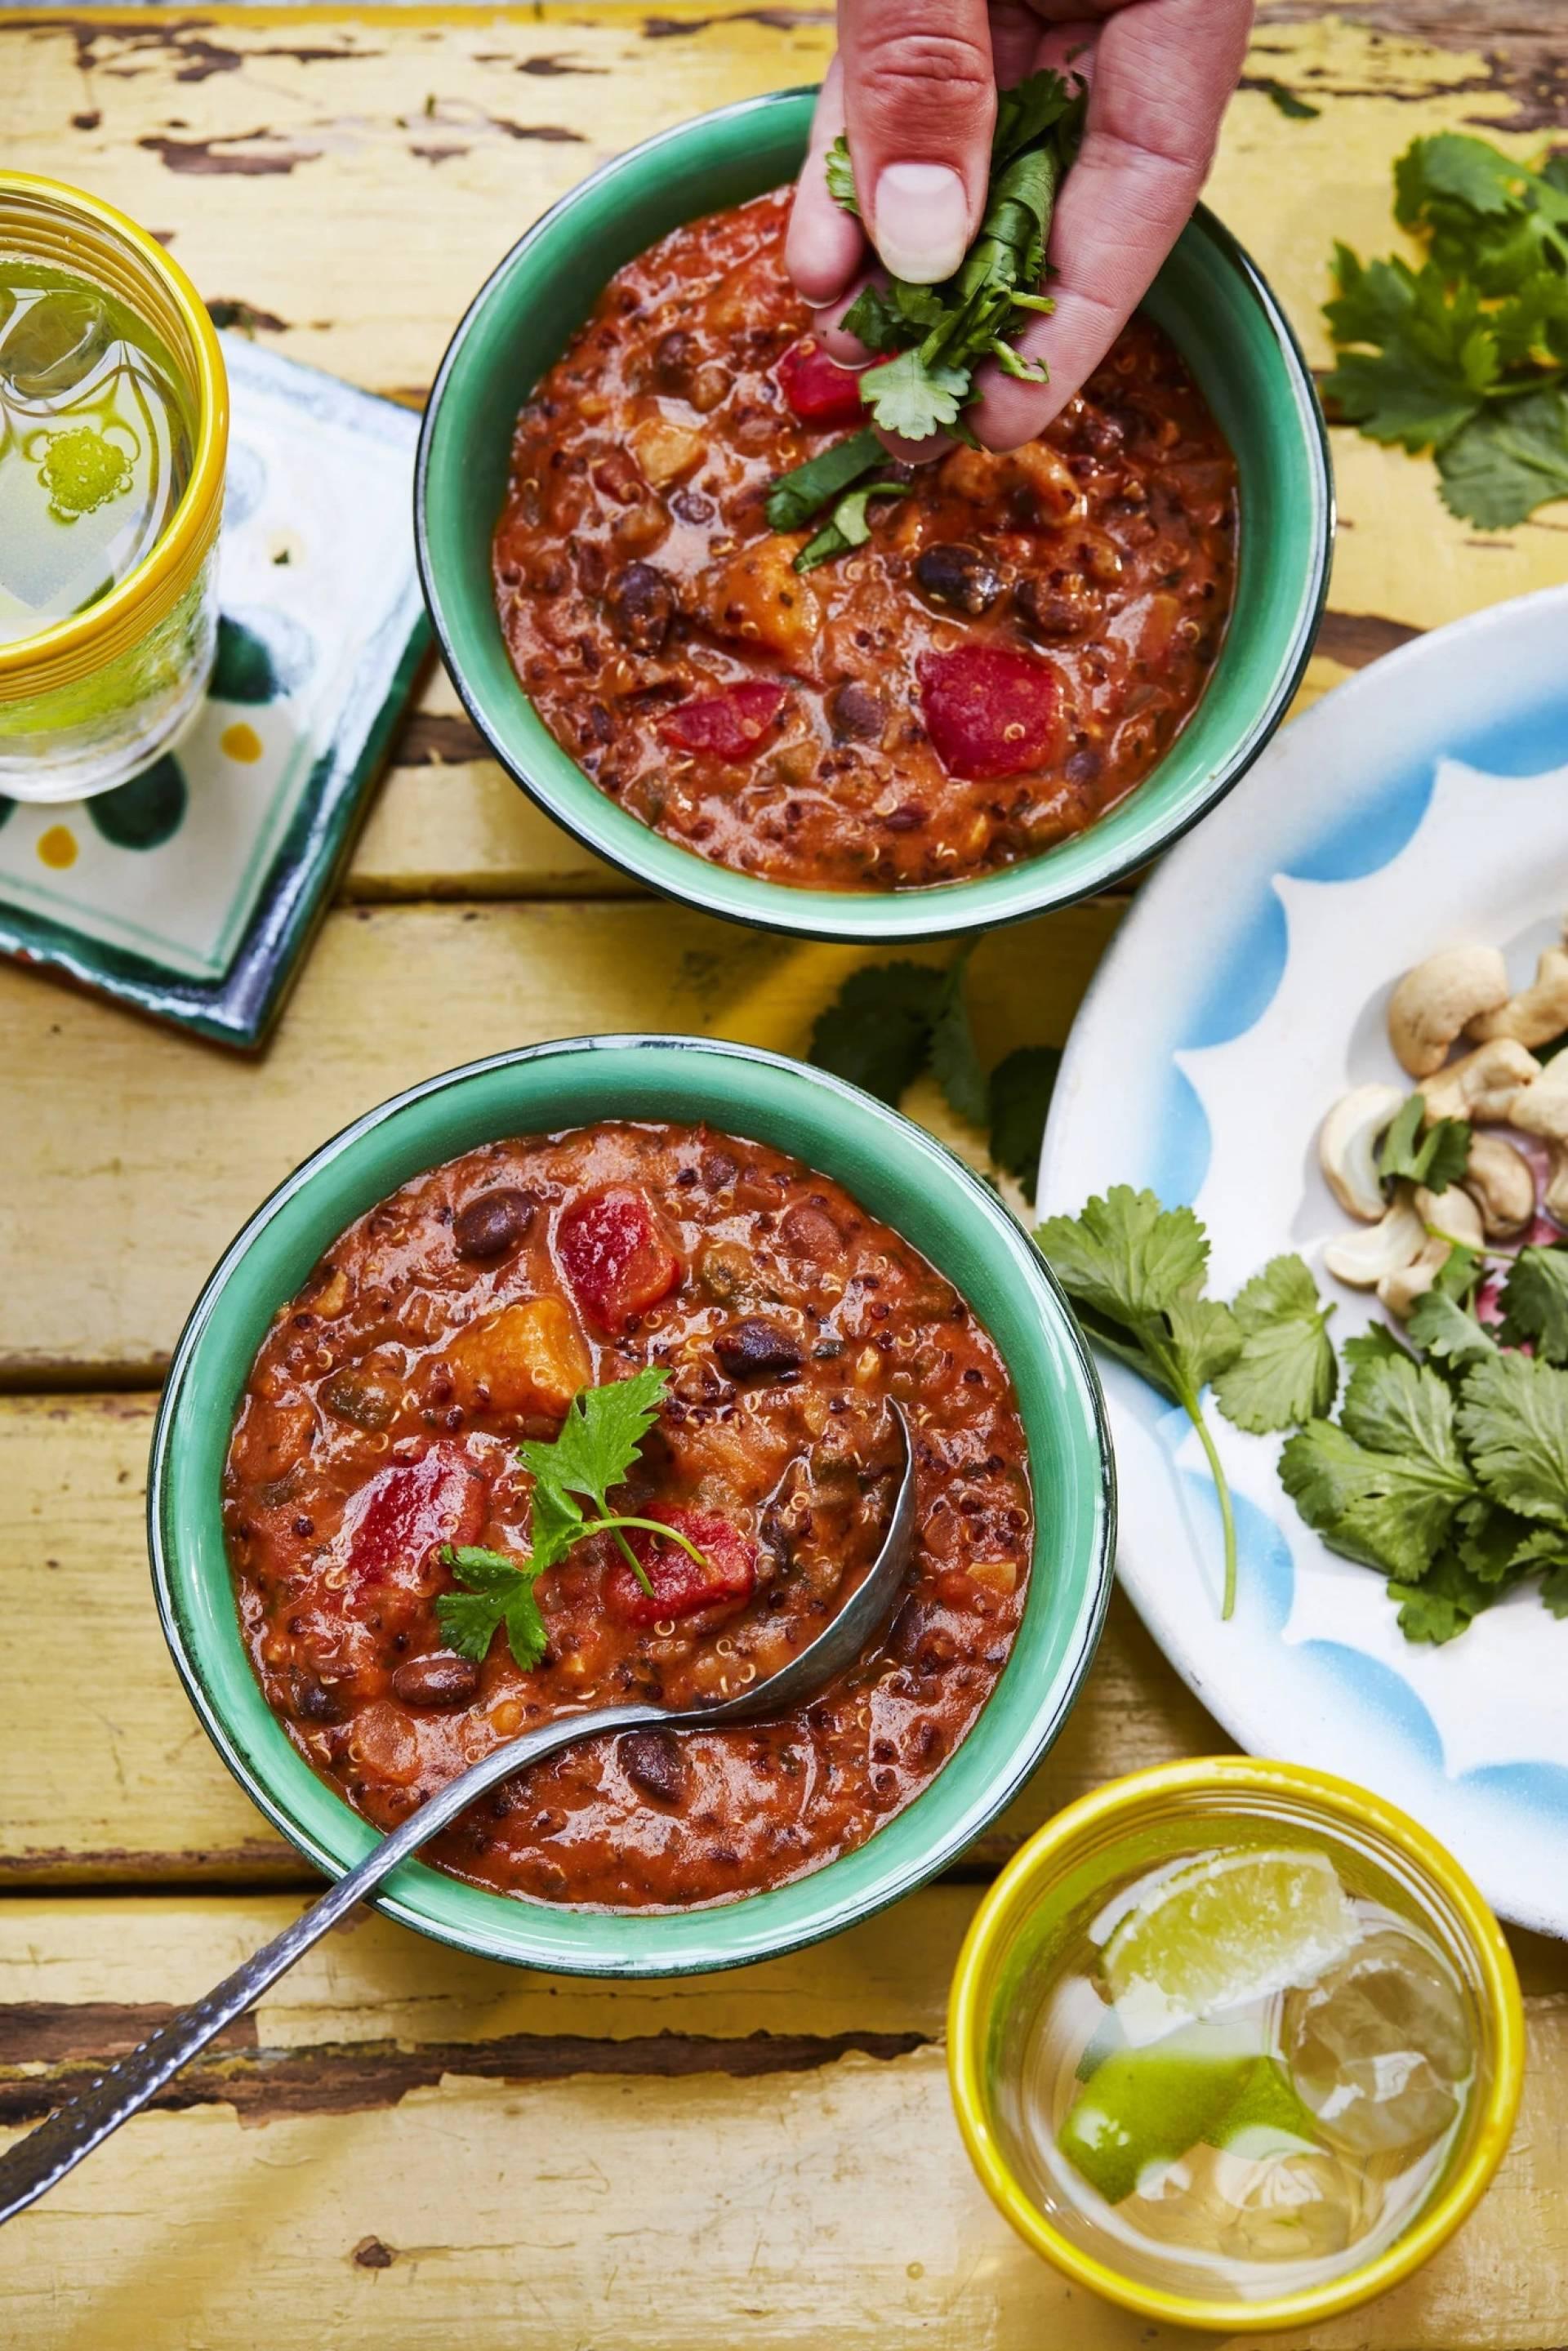 Tomato, Black Bean with Cashews & Quinoa